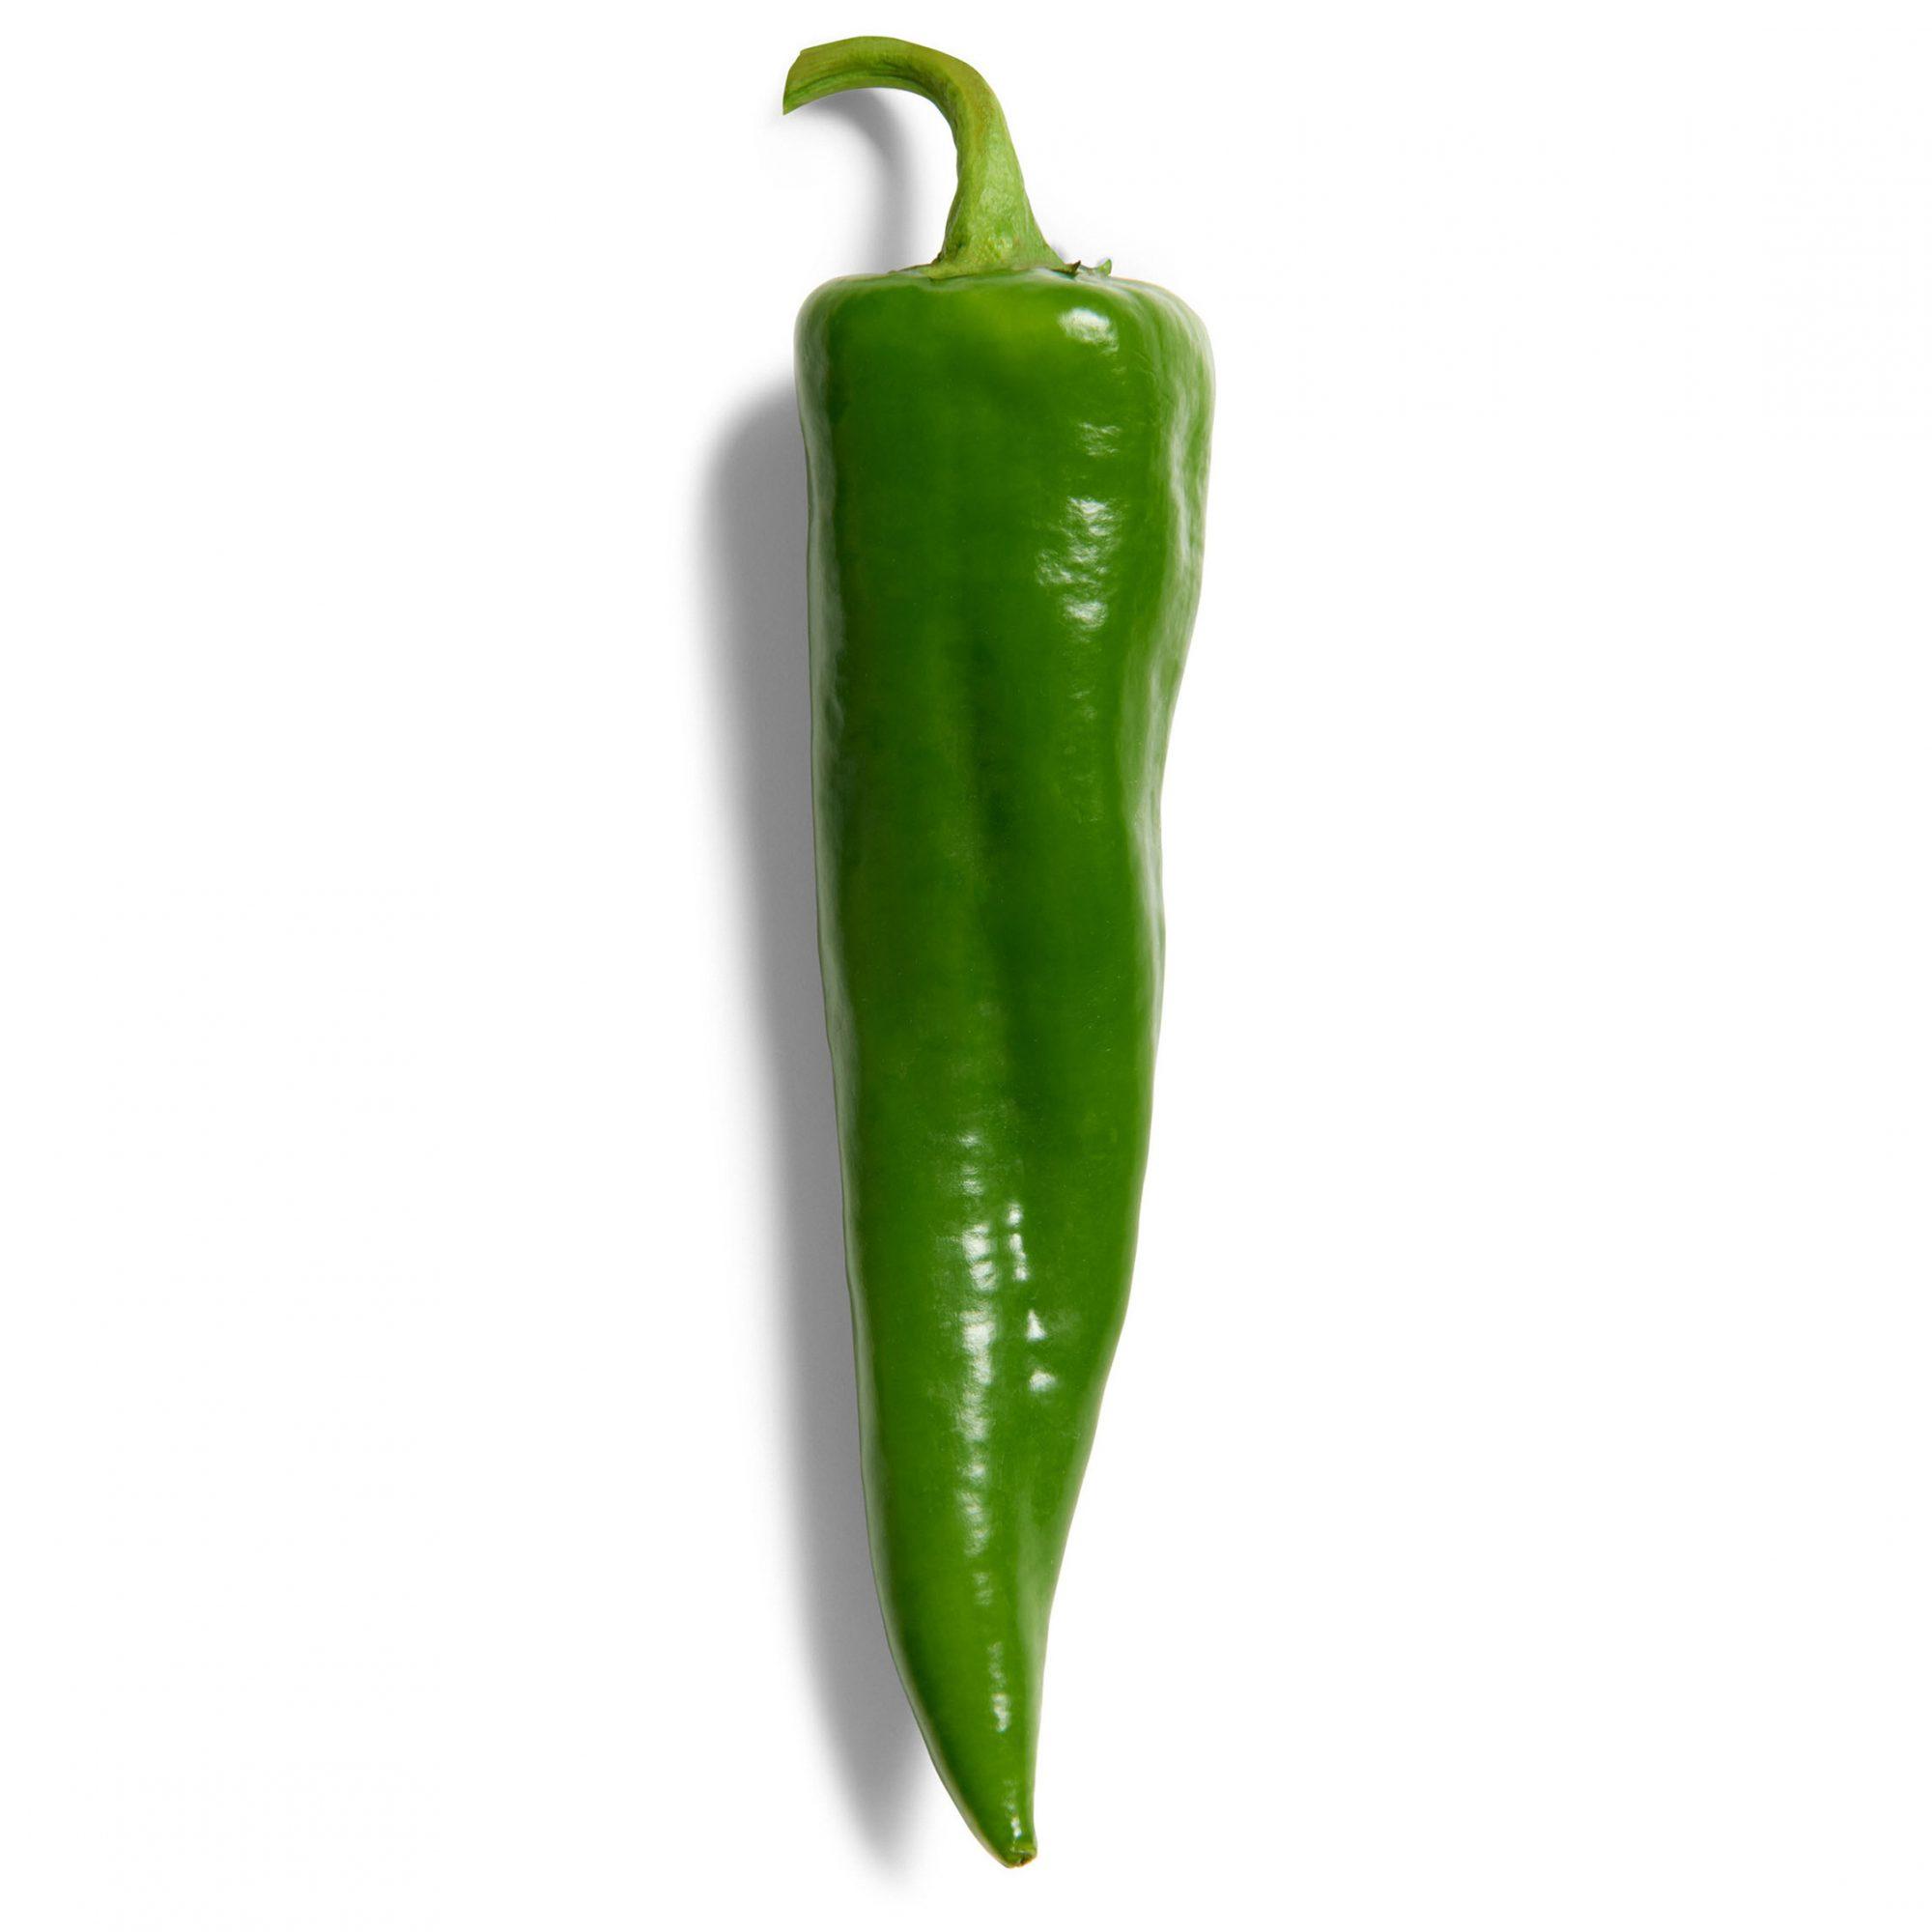 anaheim chile pepper